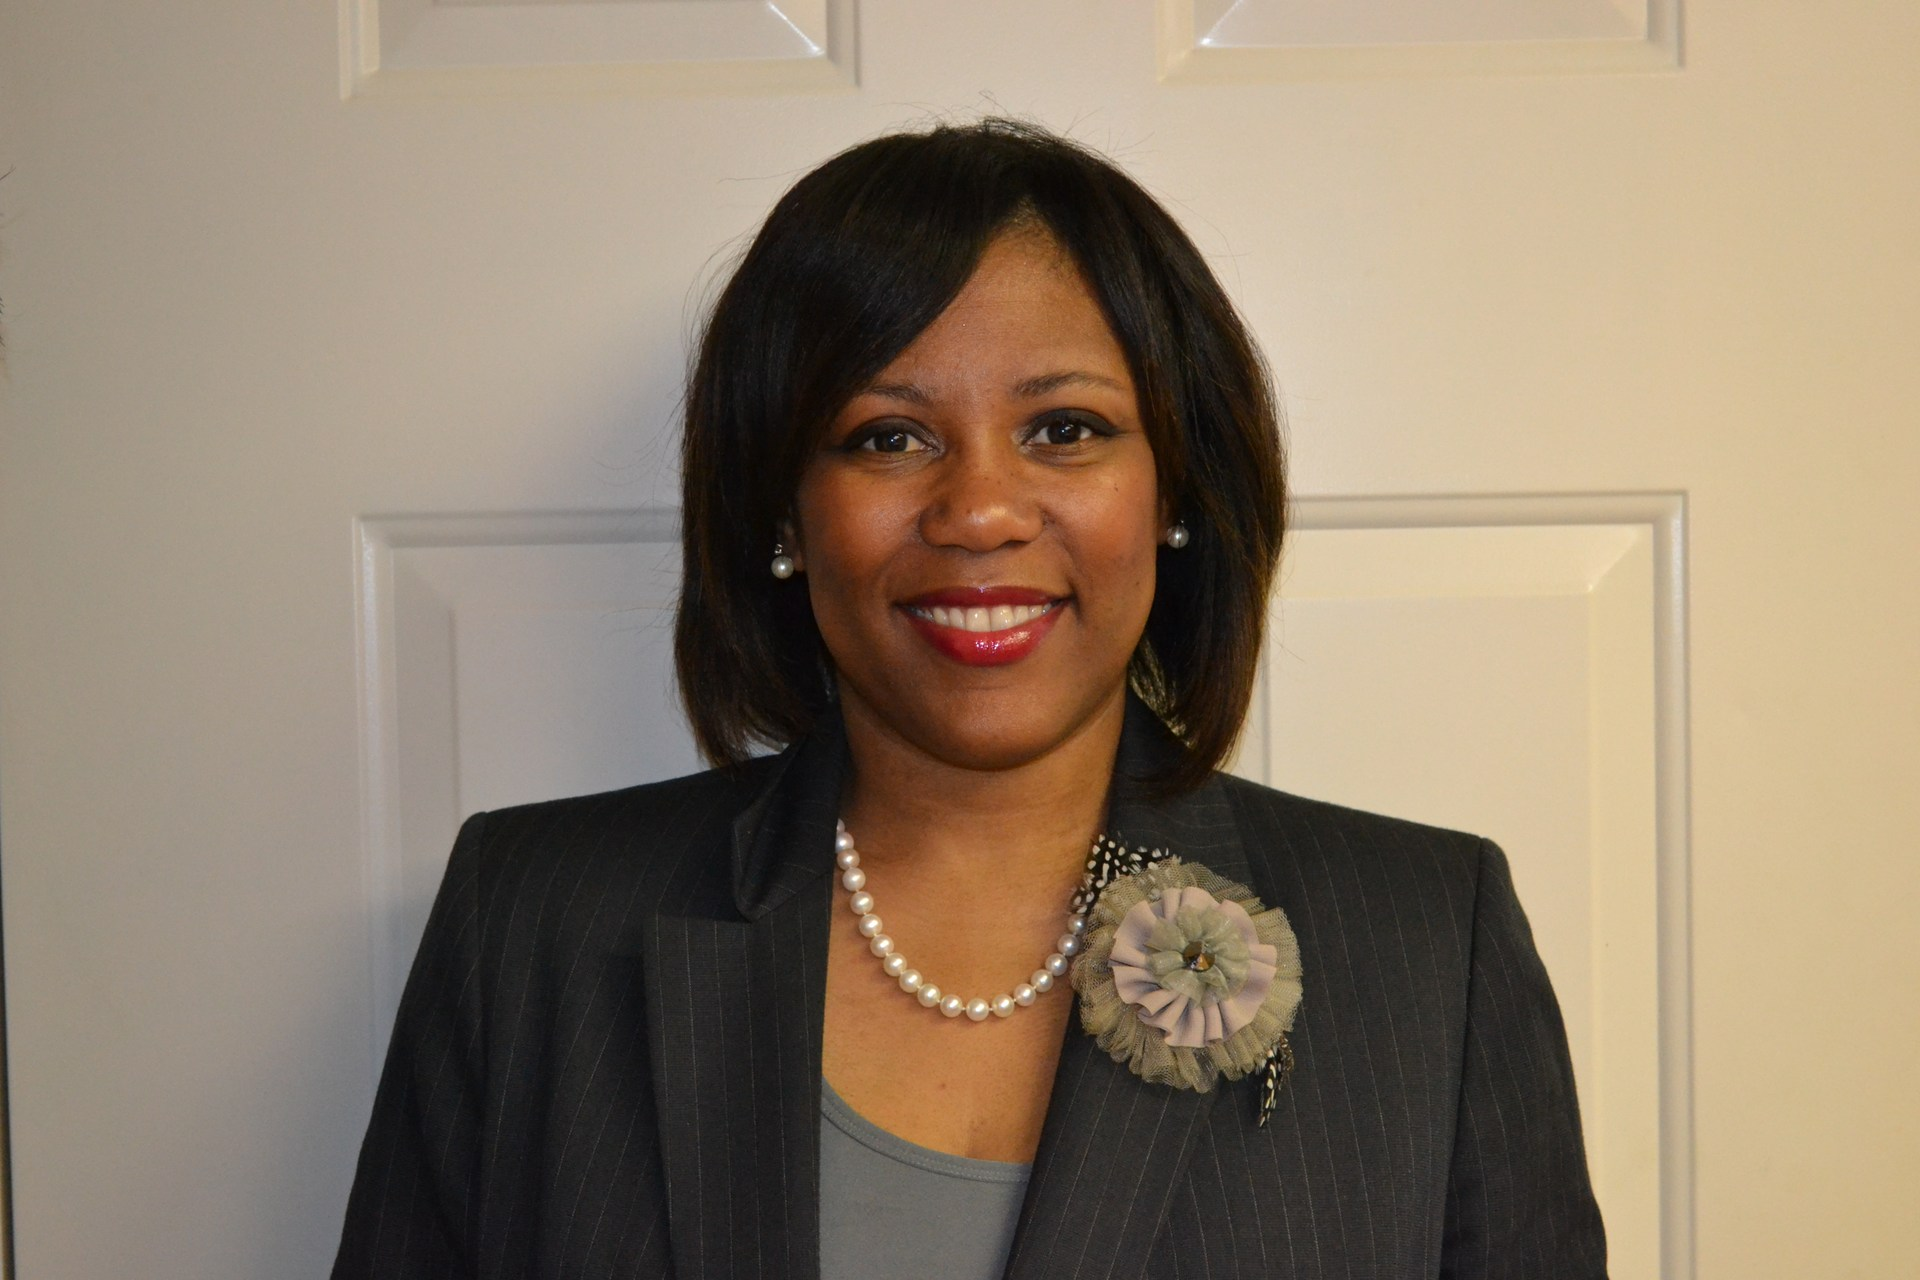 KSE Principle Mrs. Ramica Robinson